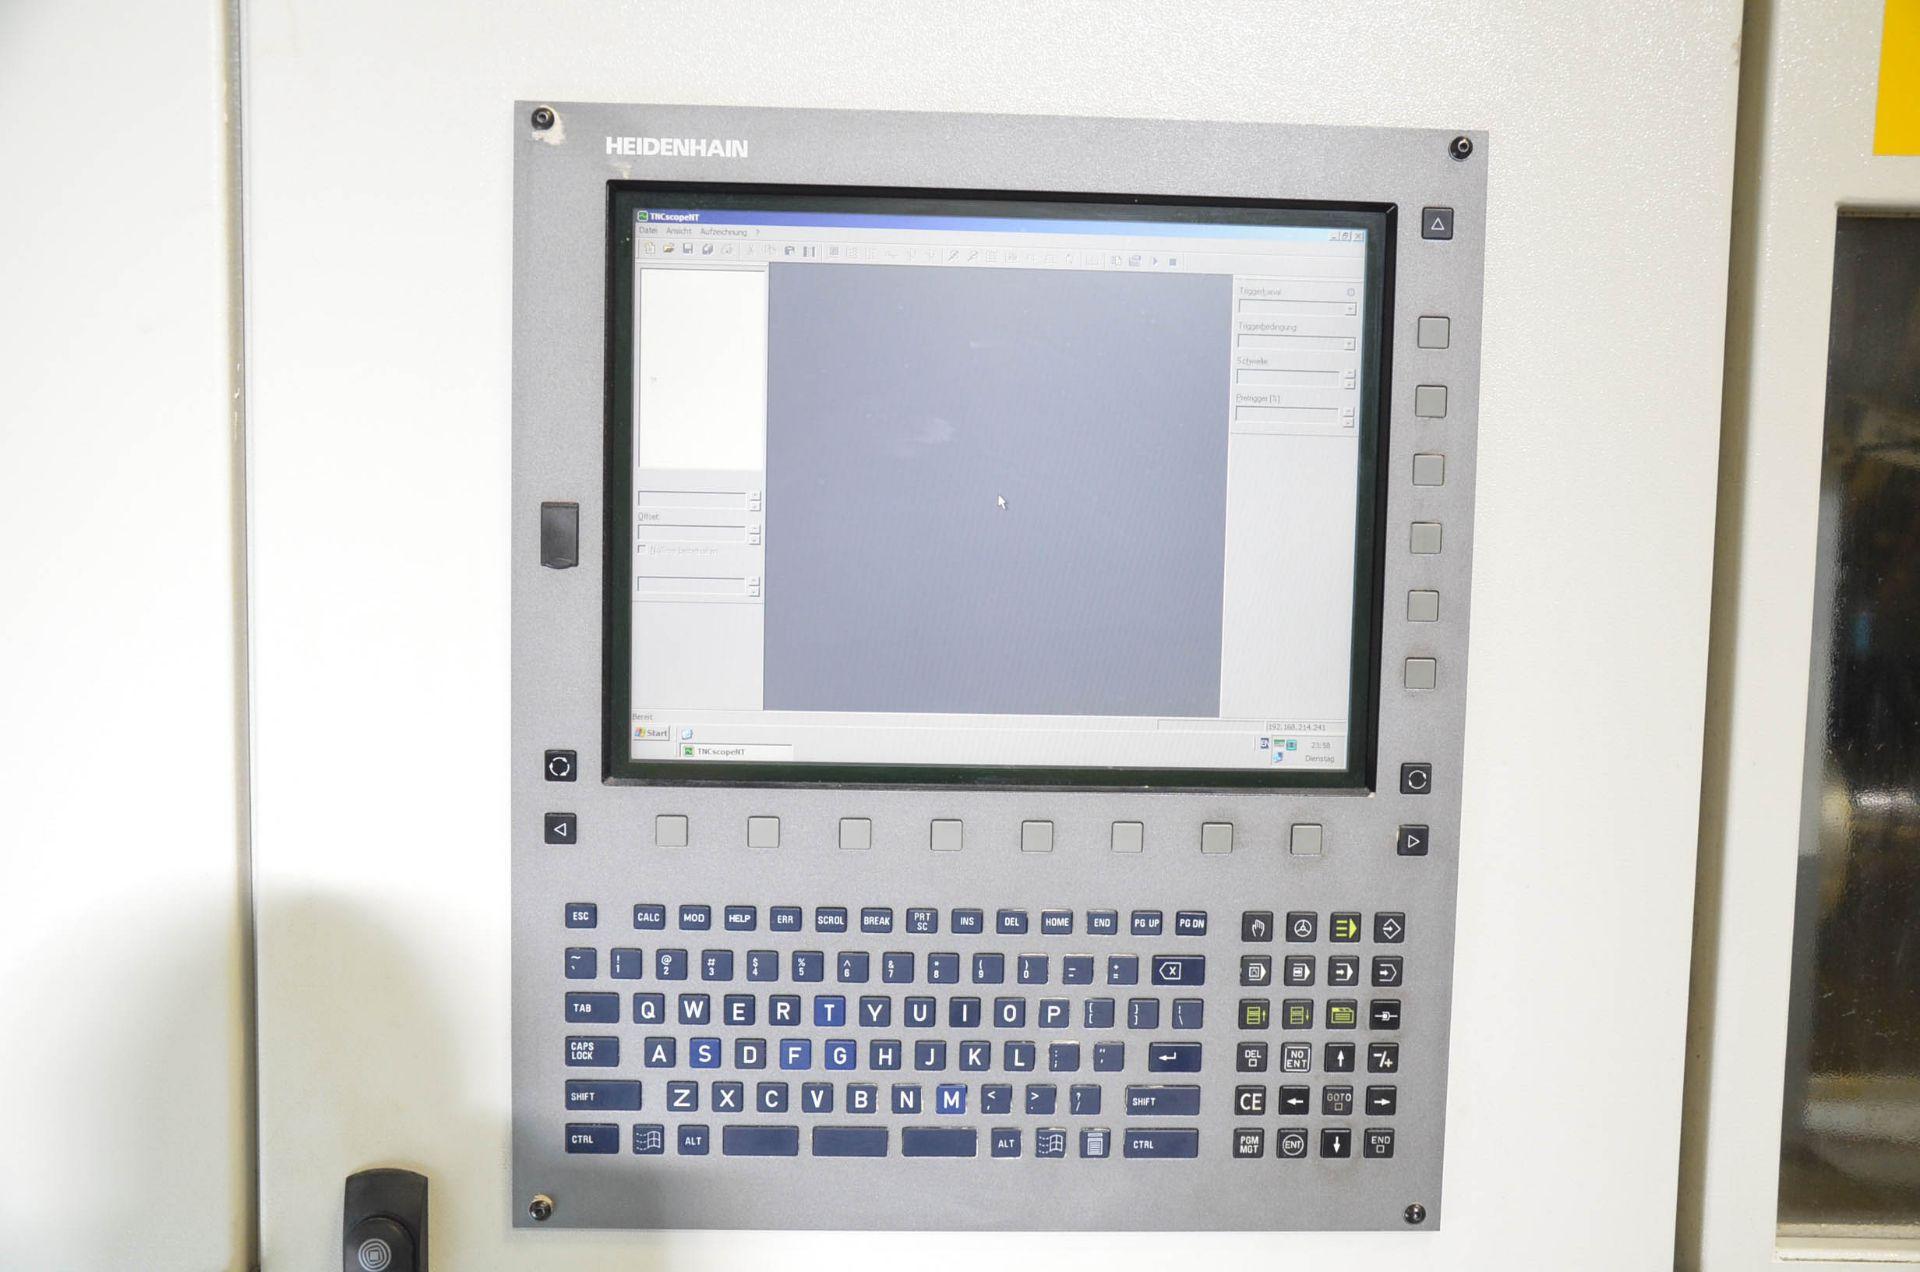 "GROB (2012) G350 5-AXIS CNC MACHINING CENTER WITH HEIDENHAIN ITNC 530 CNC CONTROL, 22.25"" DIAMETER - Image 11 of 12"